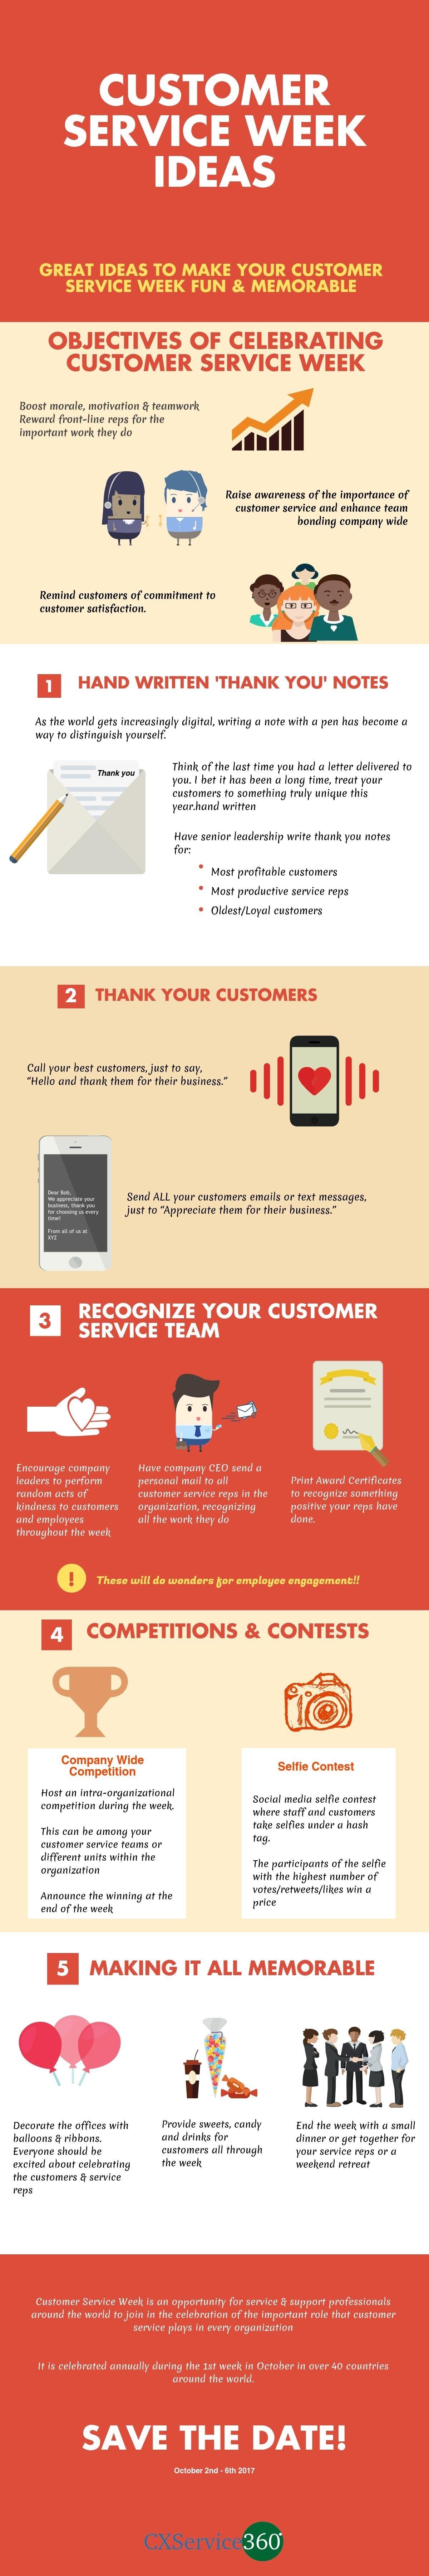 10 Nice Ideas For Customer Service Week %name 2020